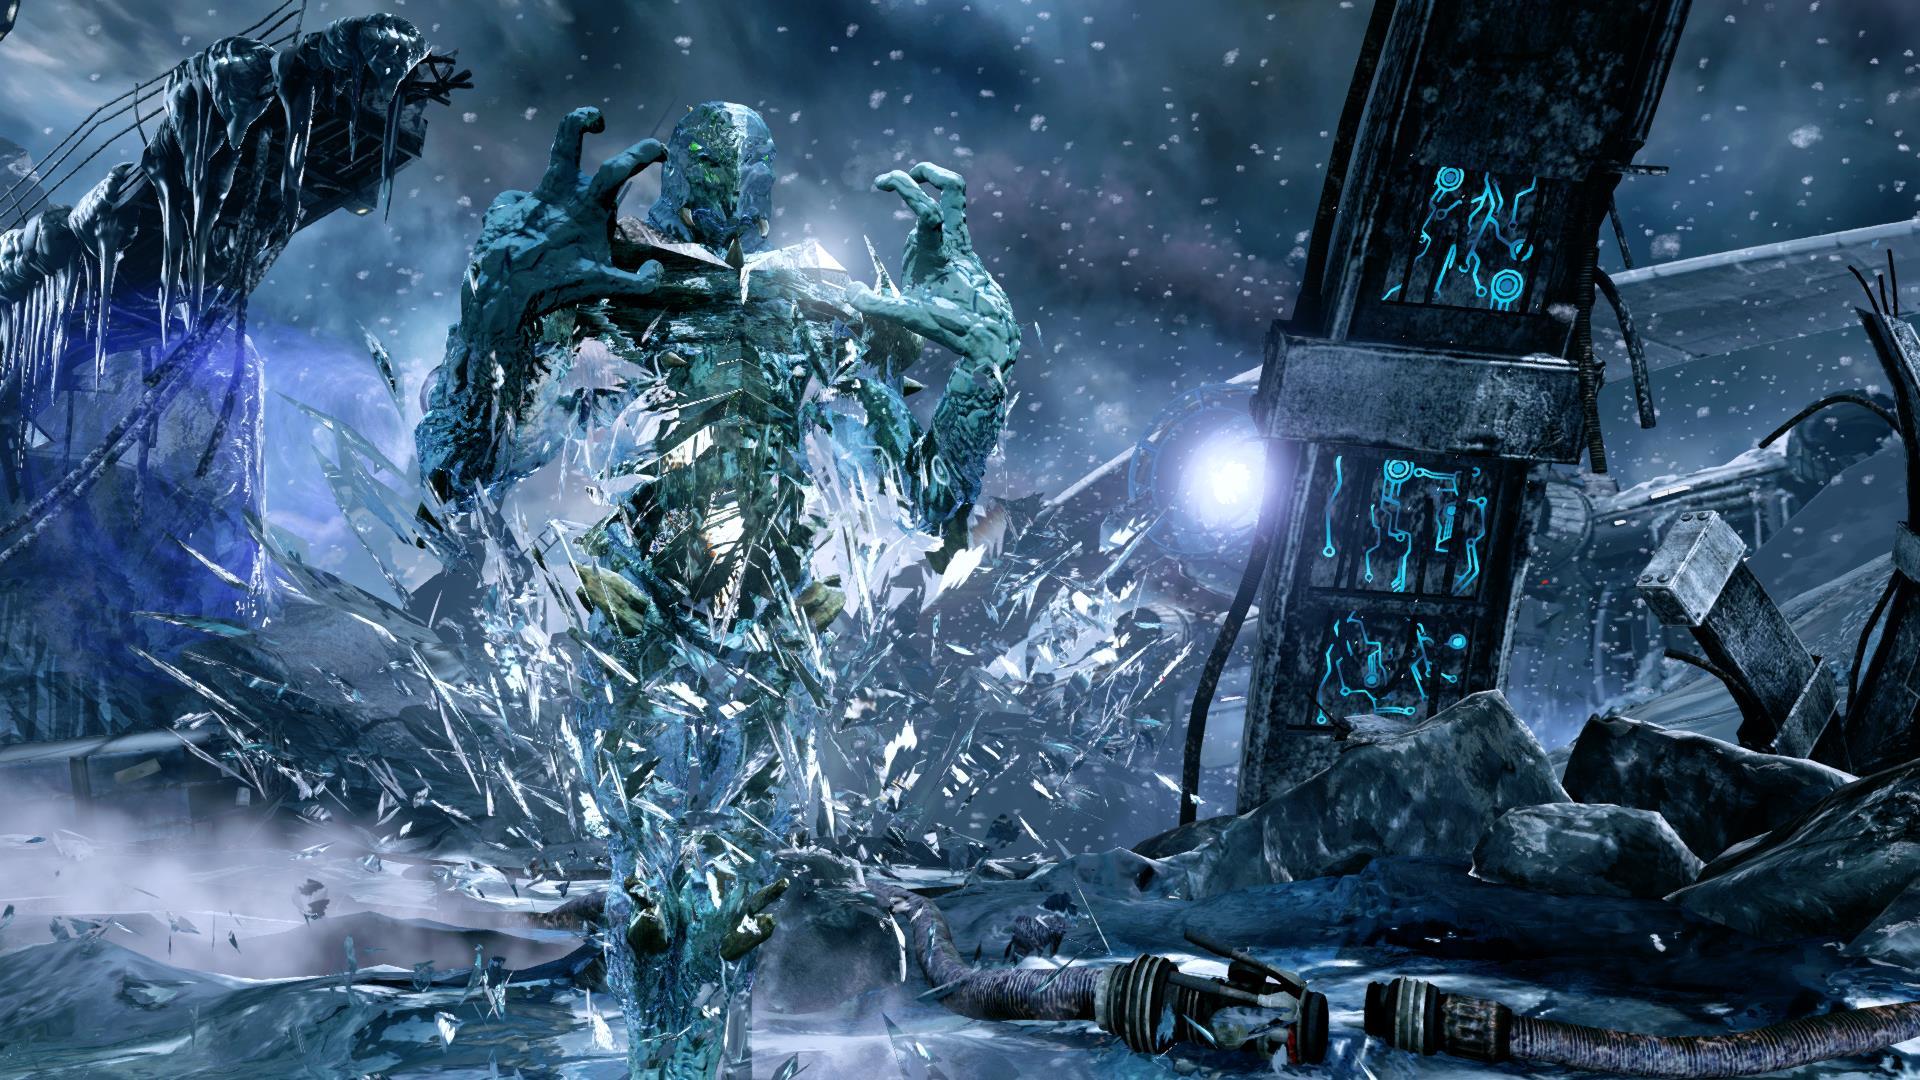 Glacius' Armor in Killer Instinct